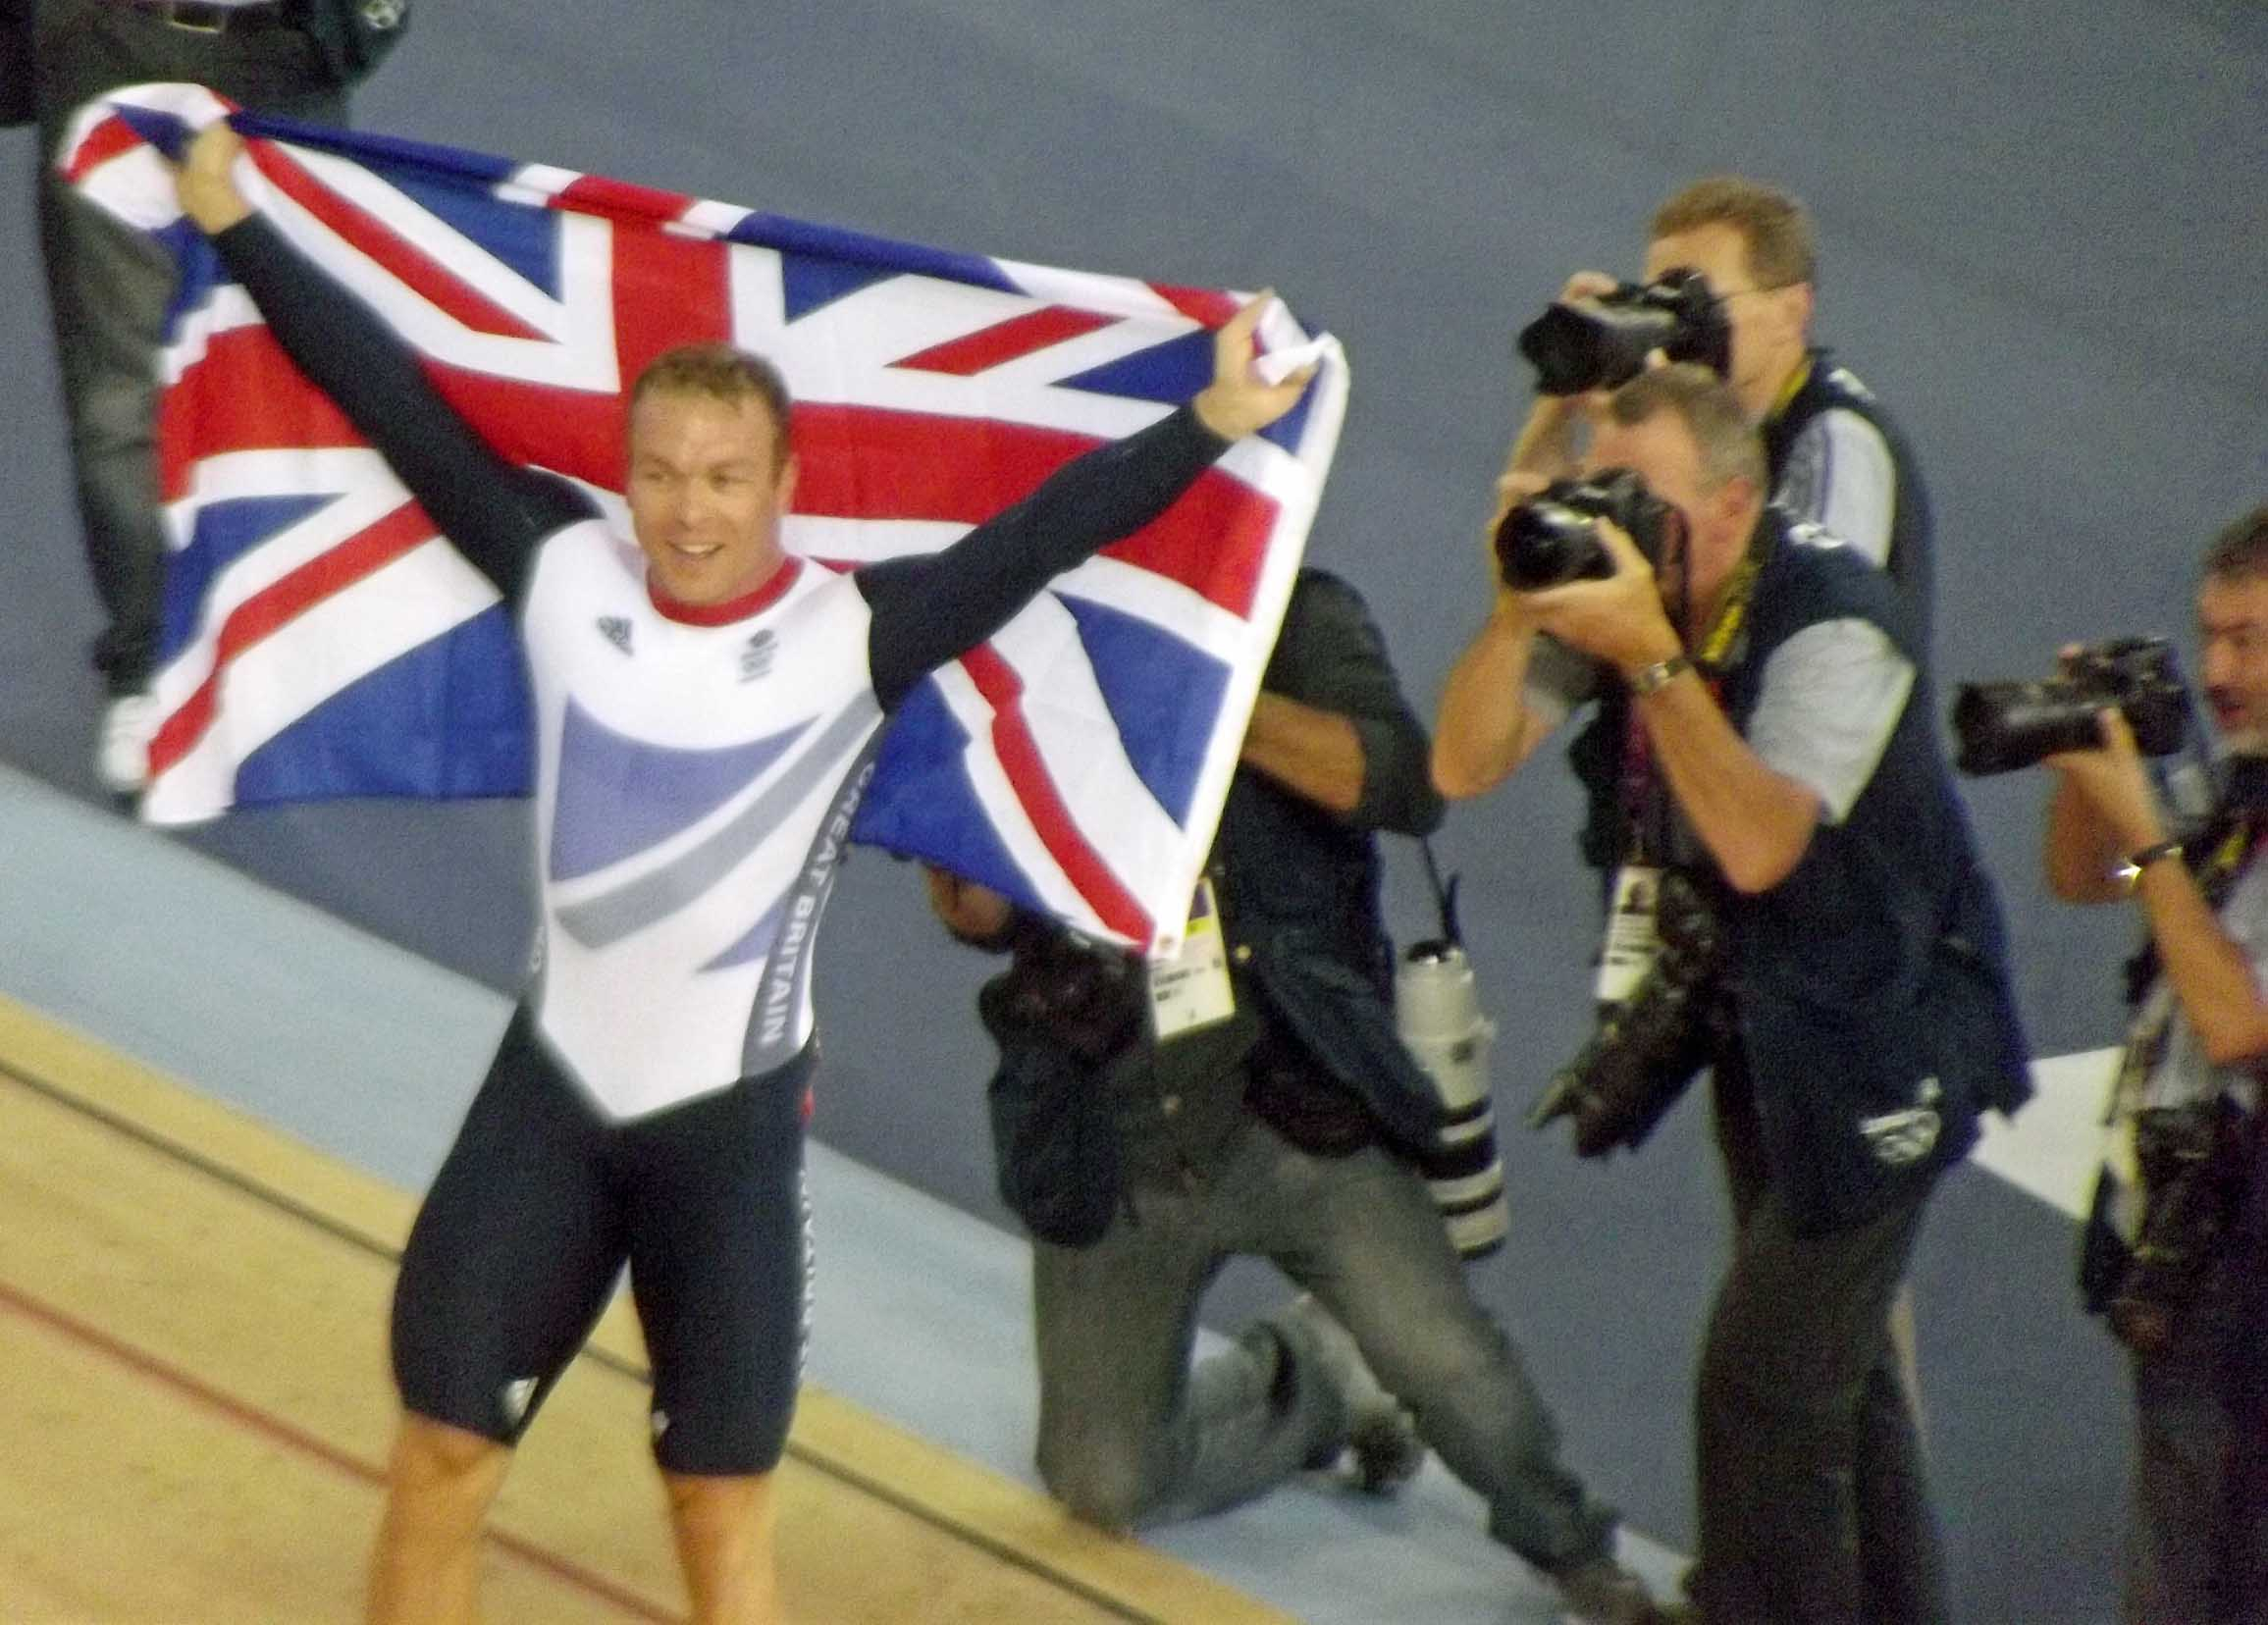 Man in lycra holding Union Jack flag